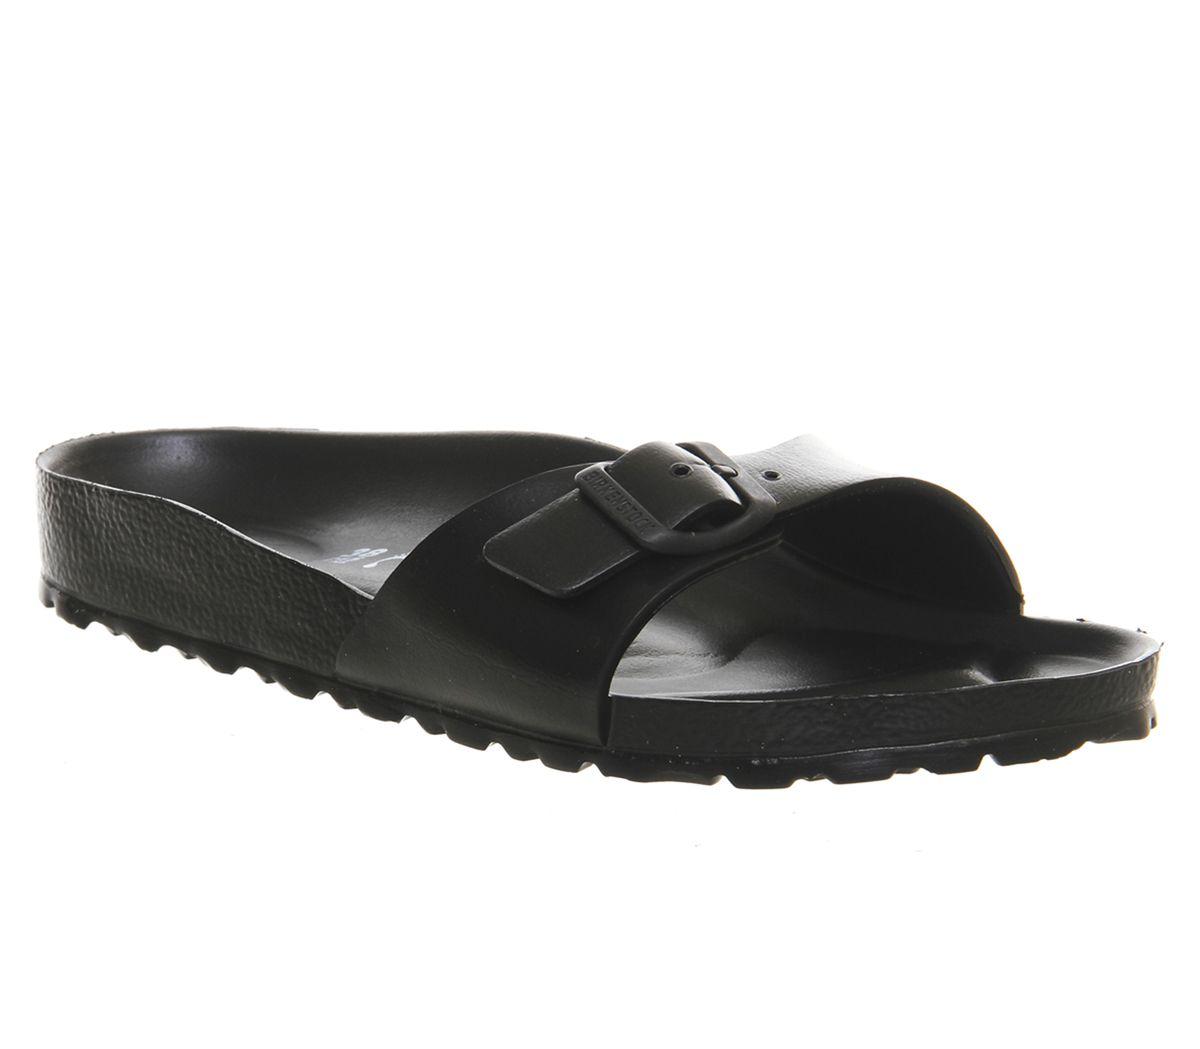 02c75b486 Birkenstock Madrid 1 Bar Mule Black Eva - Sandals